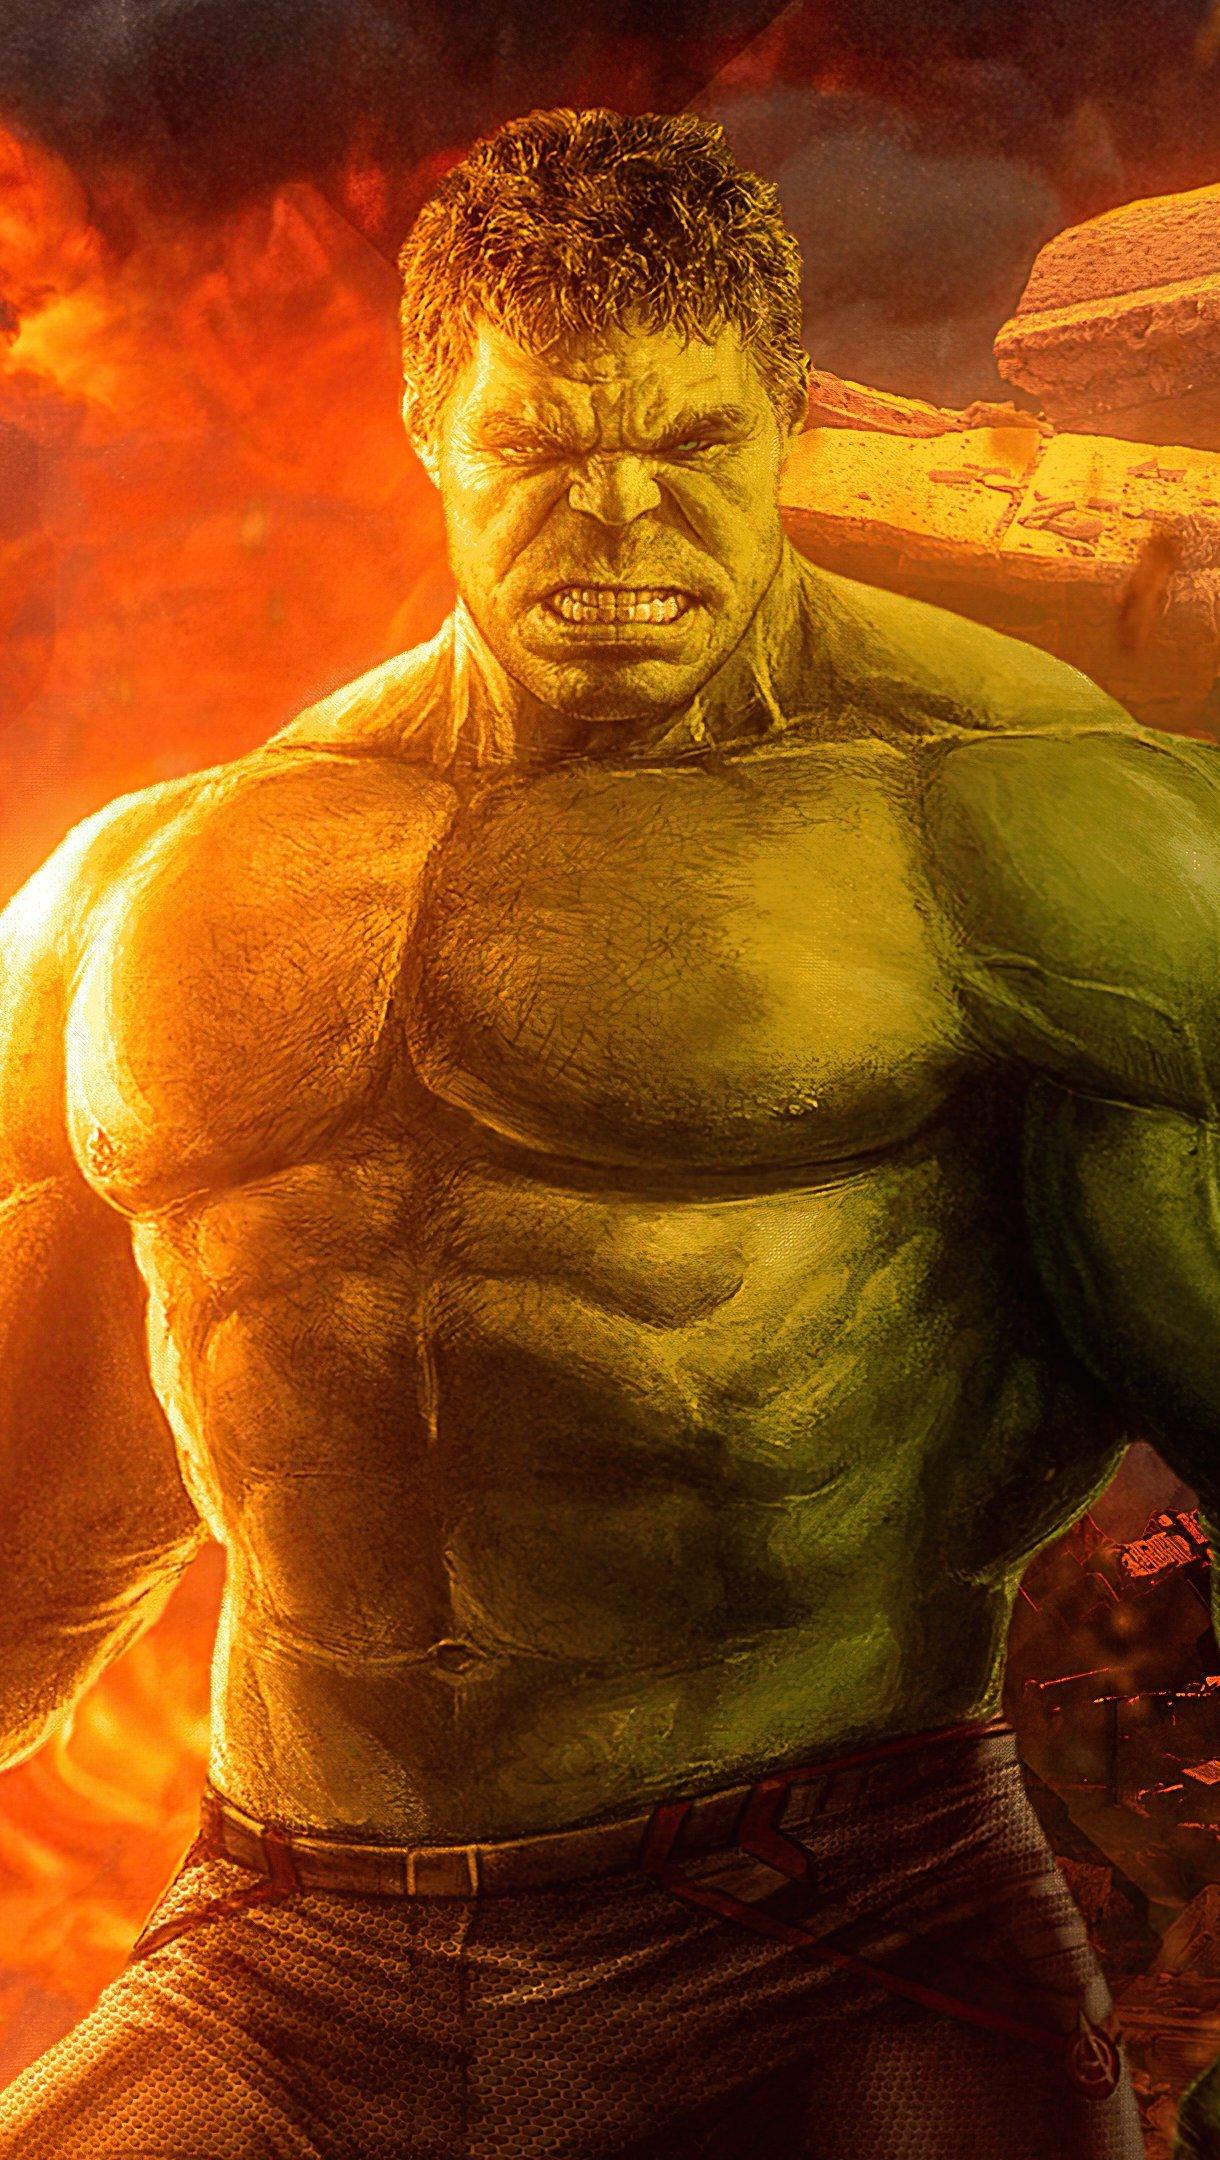 Wallpaper Hulk 2020 Artwork Vertical